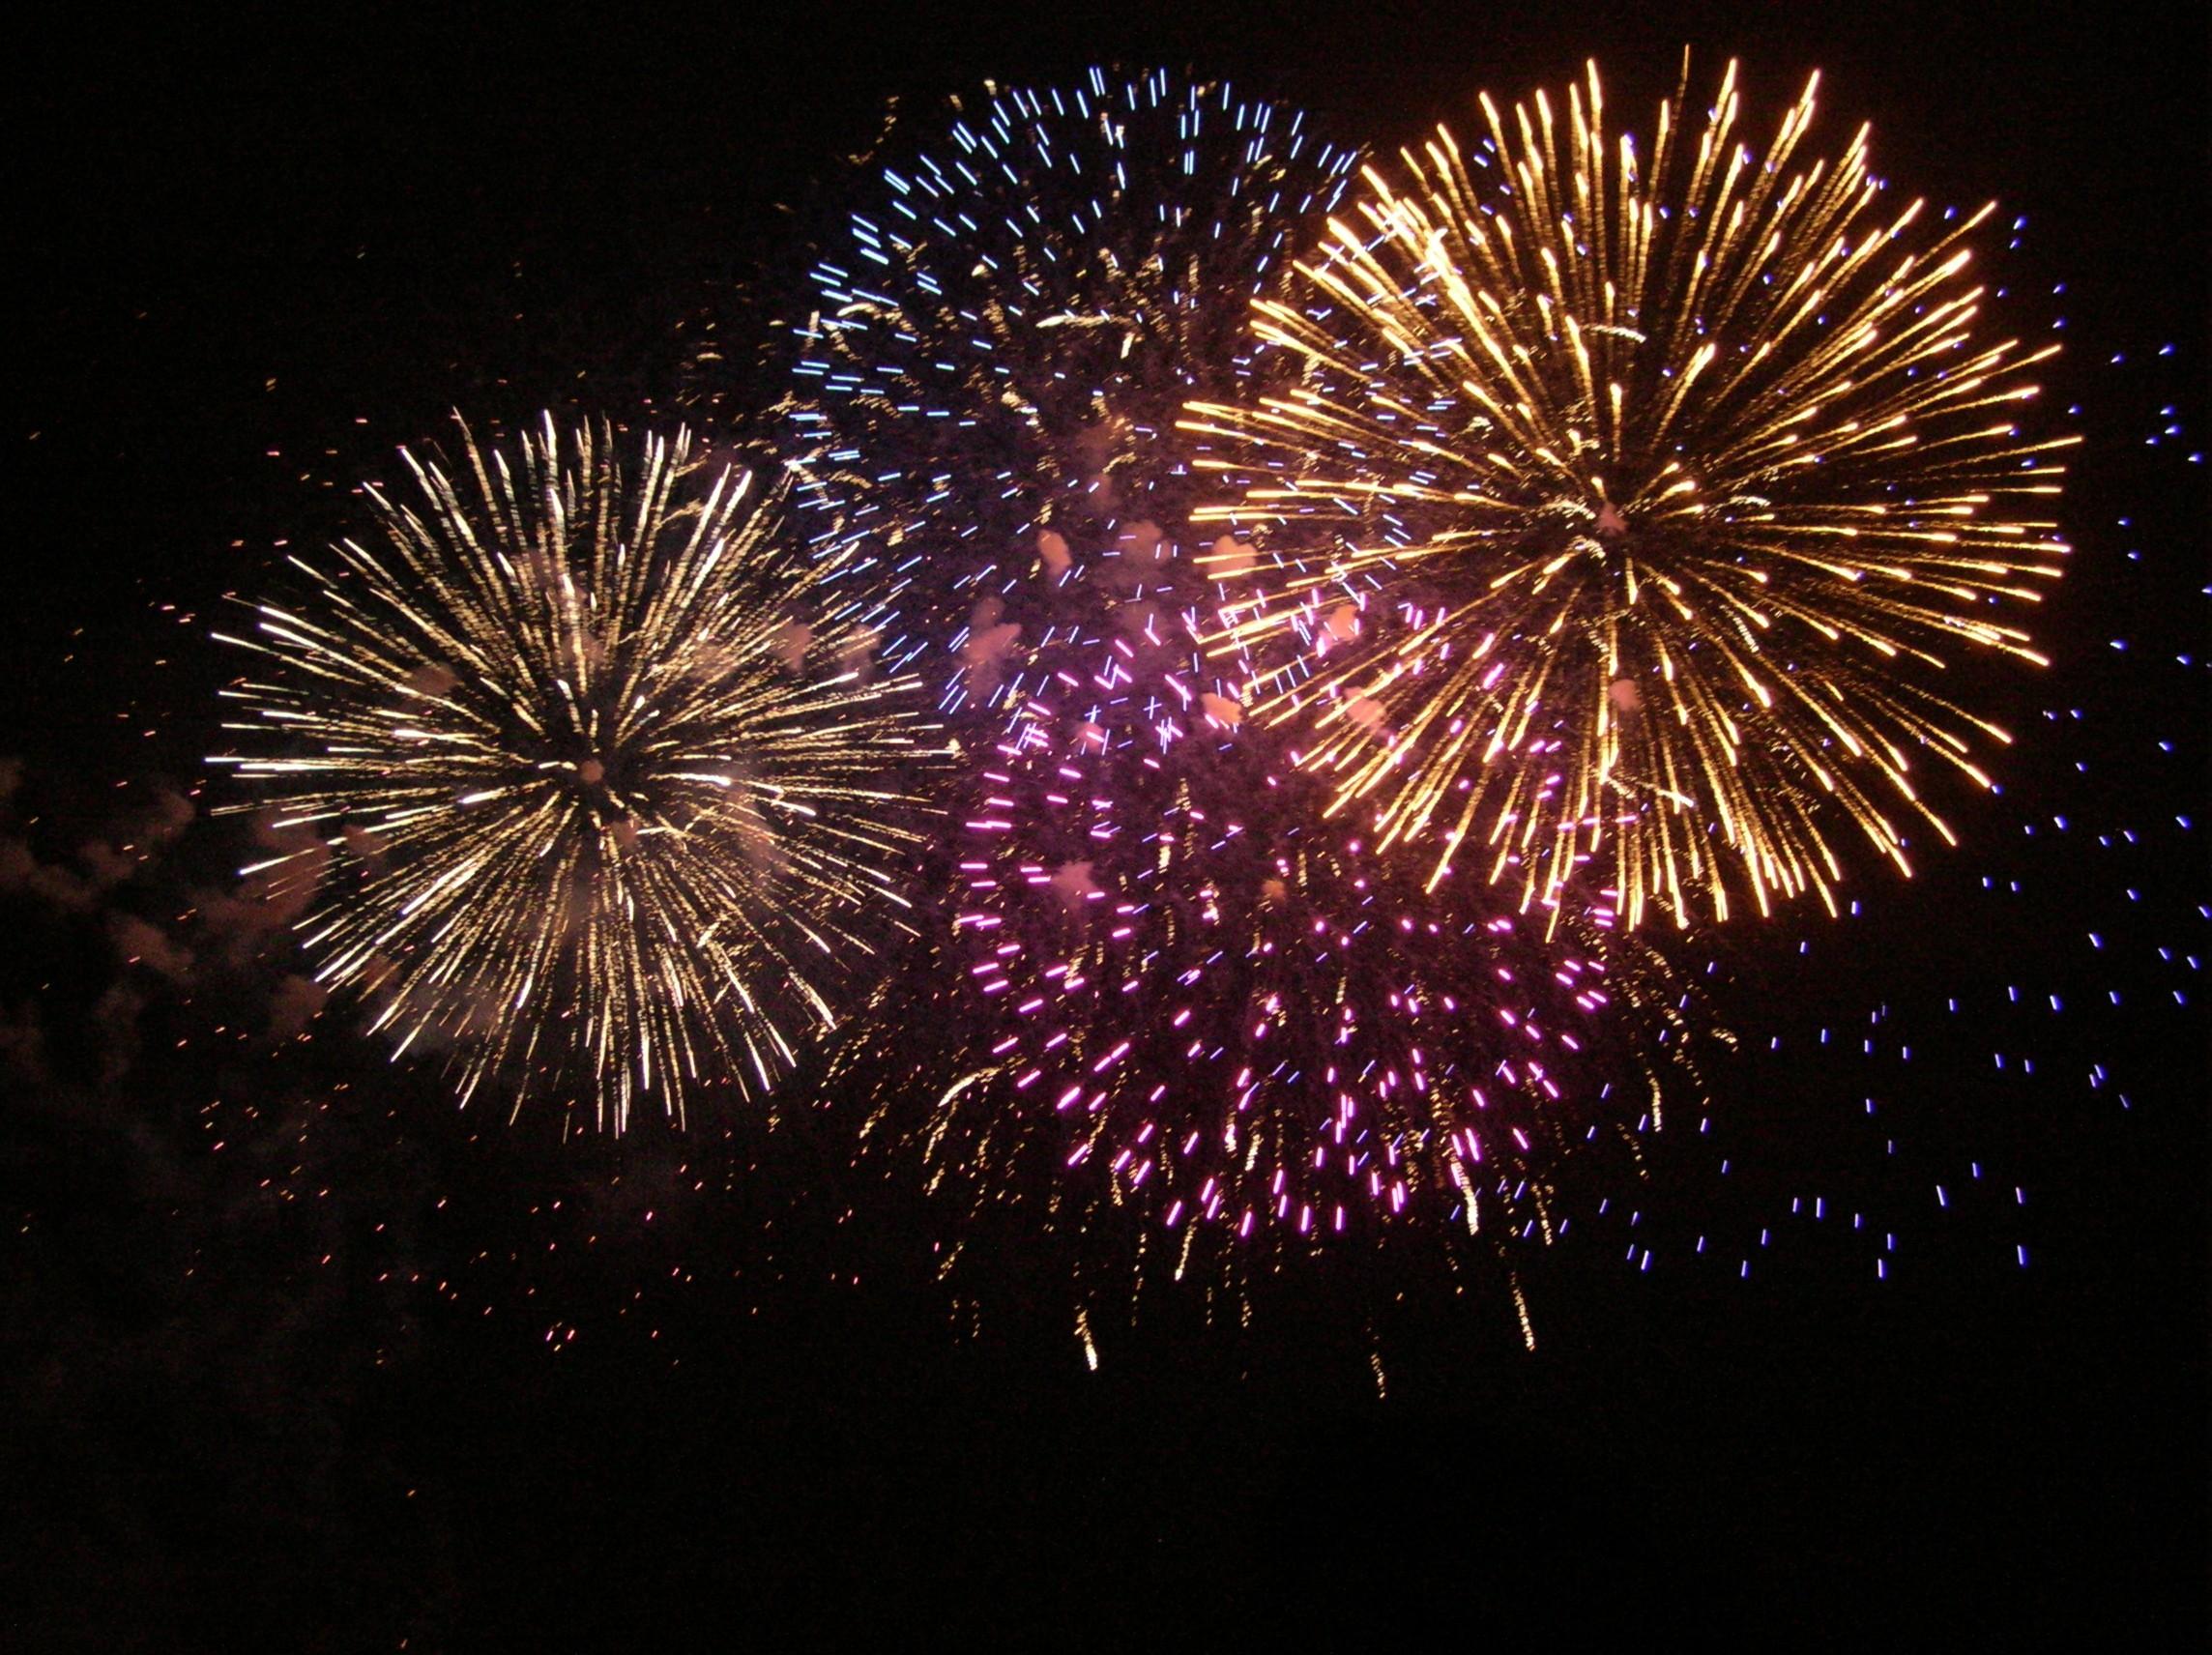 Fireworks Archives - DeKalb County Online